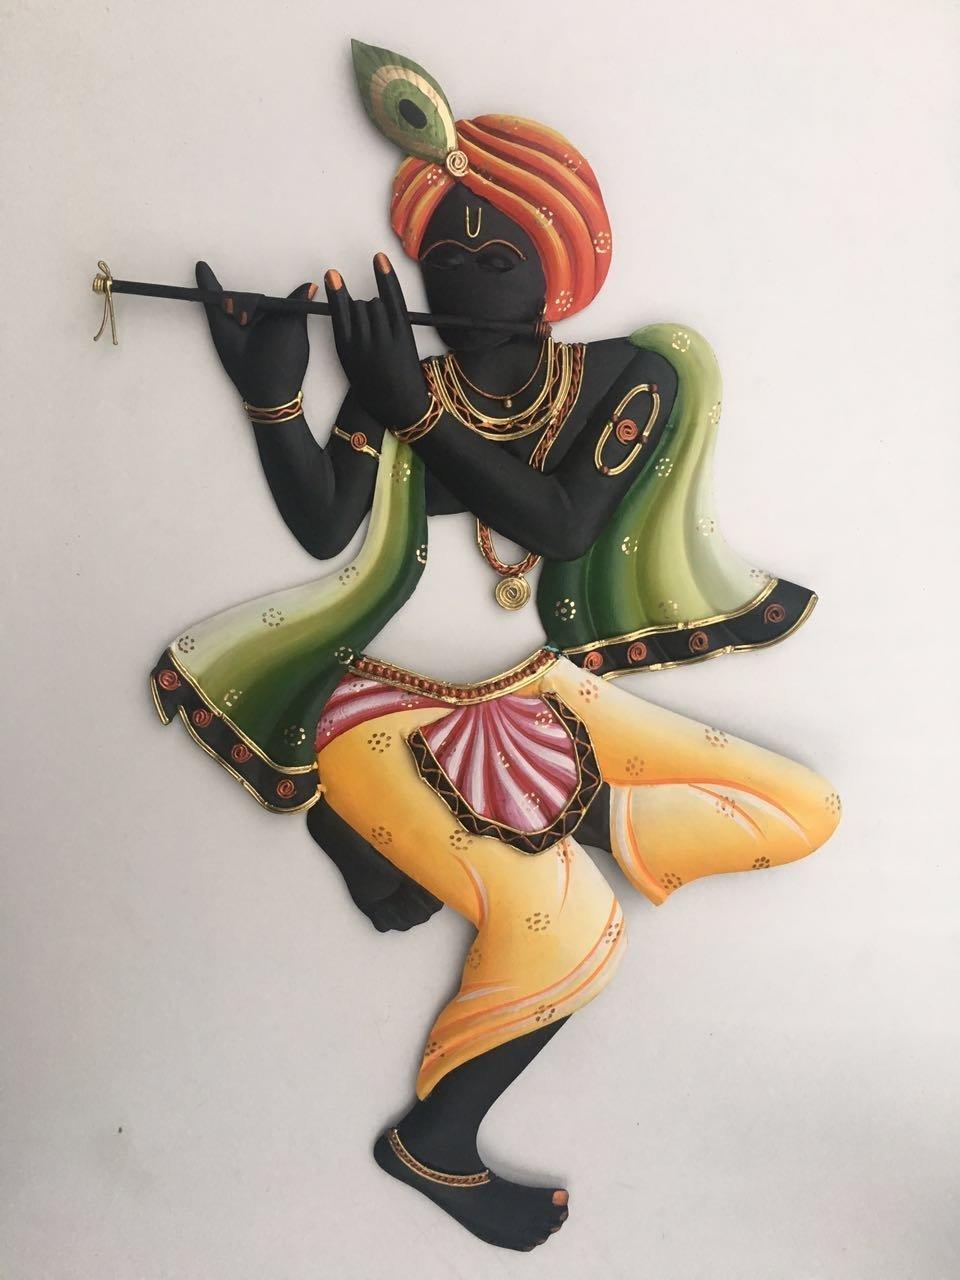 8269222aab9 Buy Karigaari Creative Dancing Krishna Iron Wall Hanging (40.64 cm x 5 cm x  55.88 cm) Online at Low Prices in India - Amazon.in